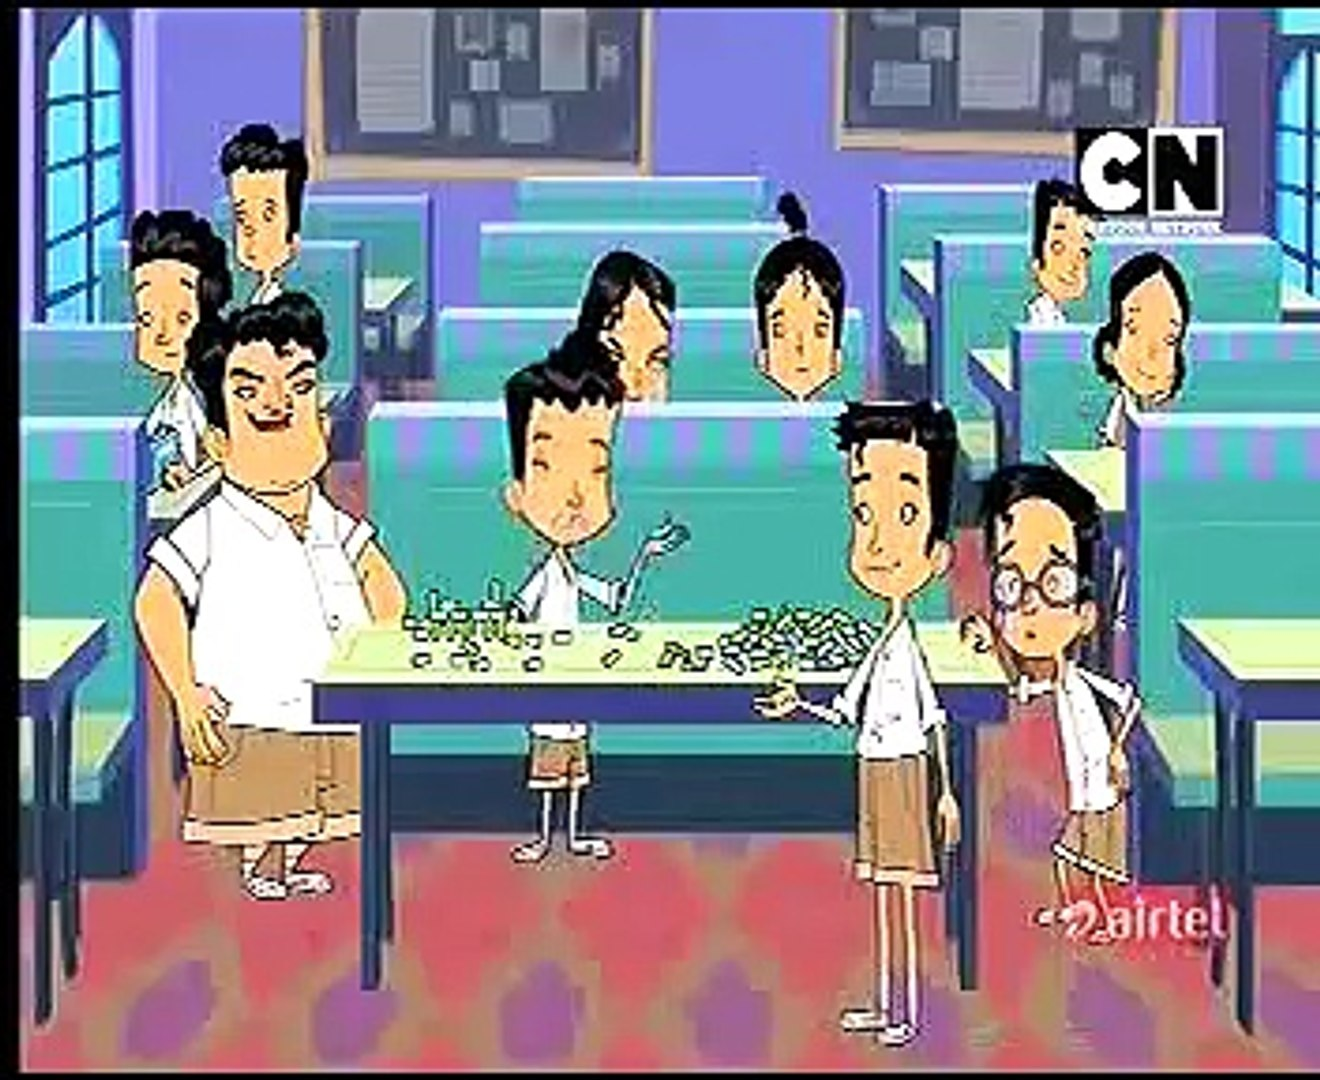 Chota Bheem Cartoon  Cartoon Network  Best Cartoon for Kids  Cartoon in Urdu  Hindi Cartoon